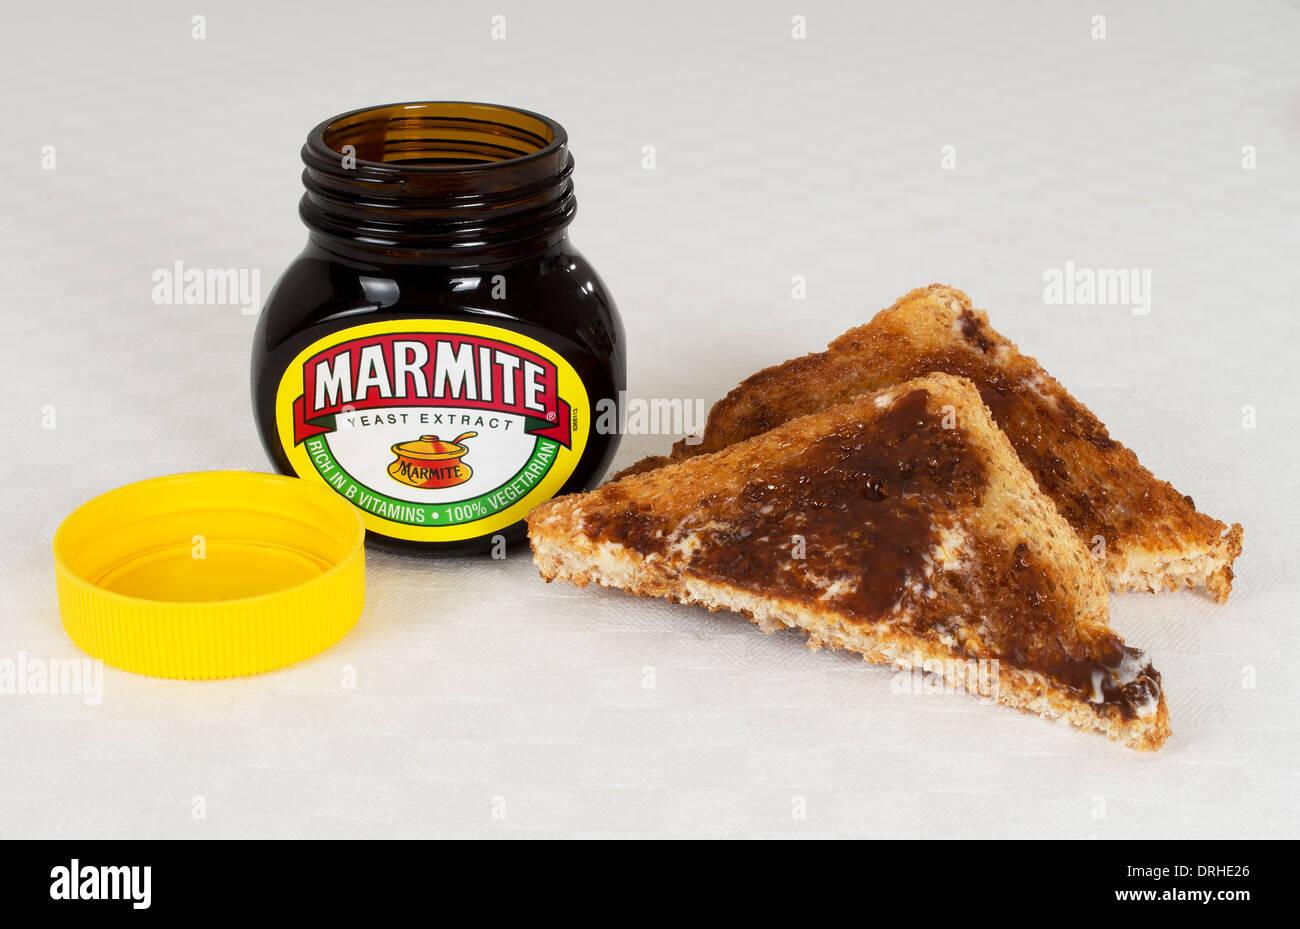 Marmite Photo Stock